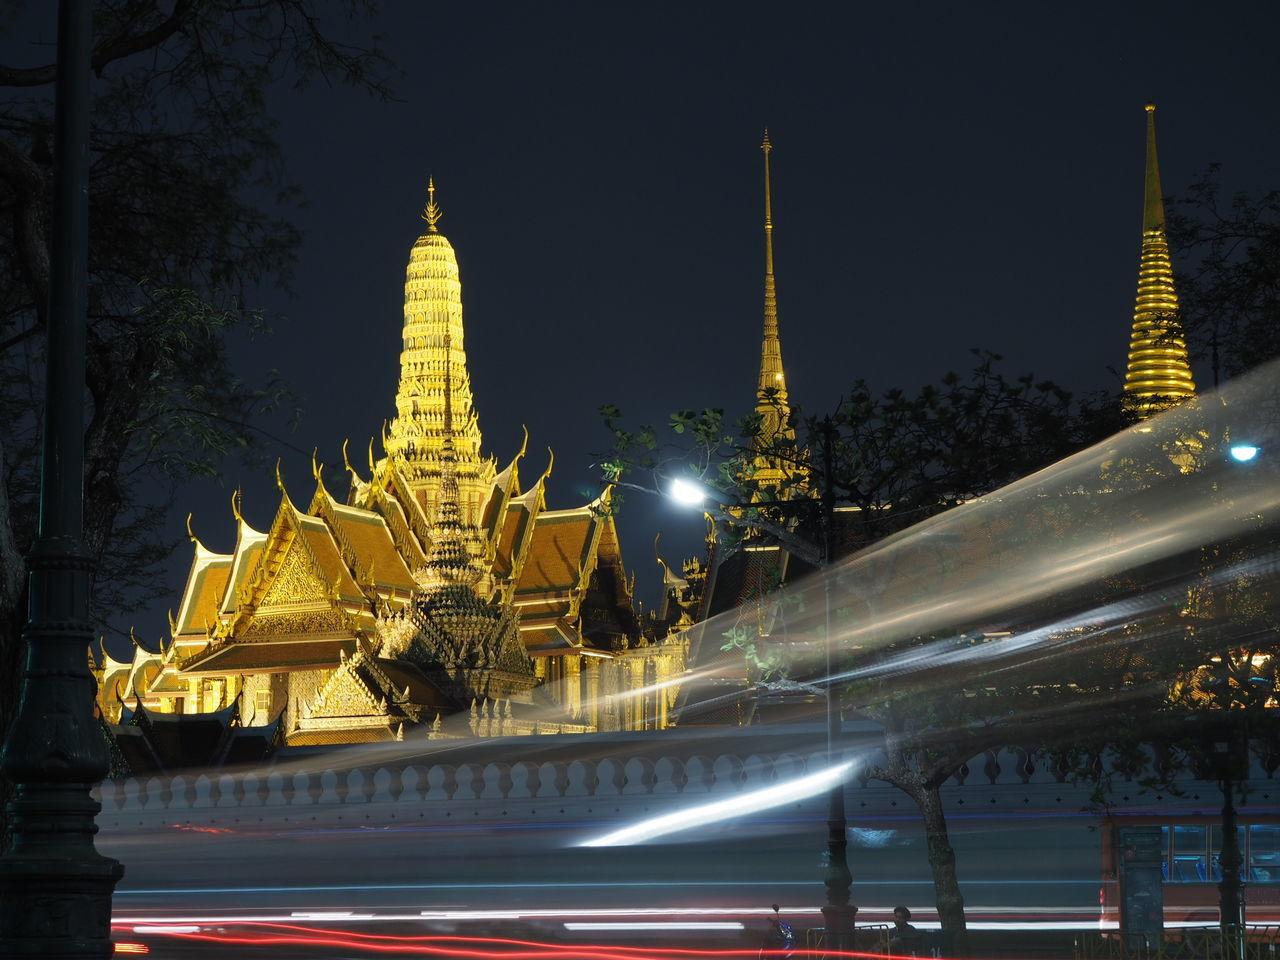 Grand Place Chakri Emerald Buddha Temple Bangkok Phra Nakhon ท่ามหาราช ท่าพระ ท่าช้าง